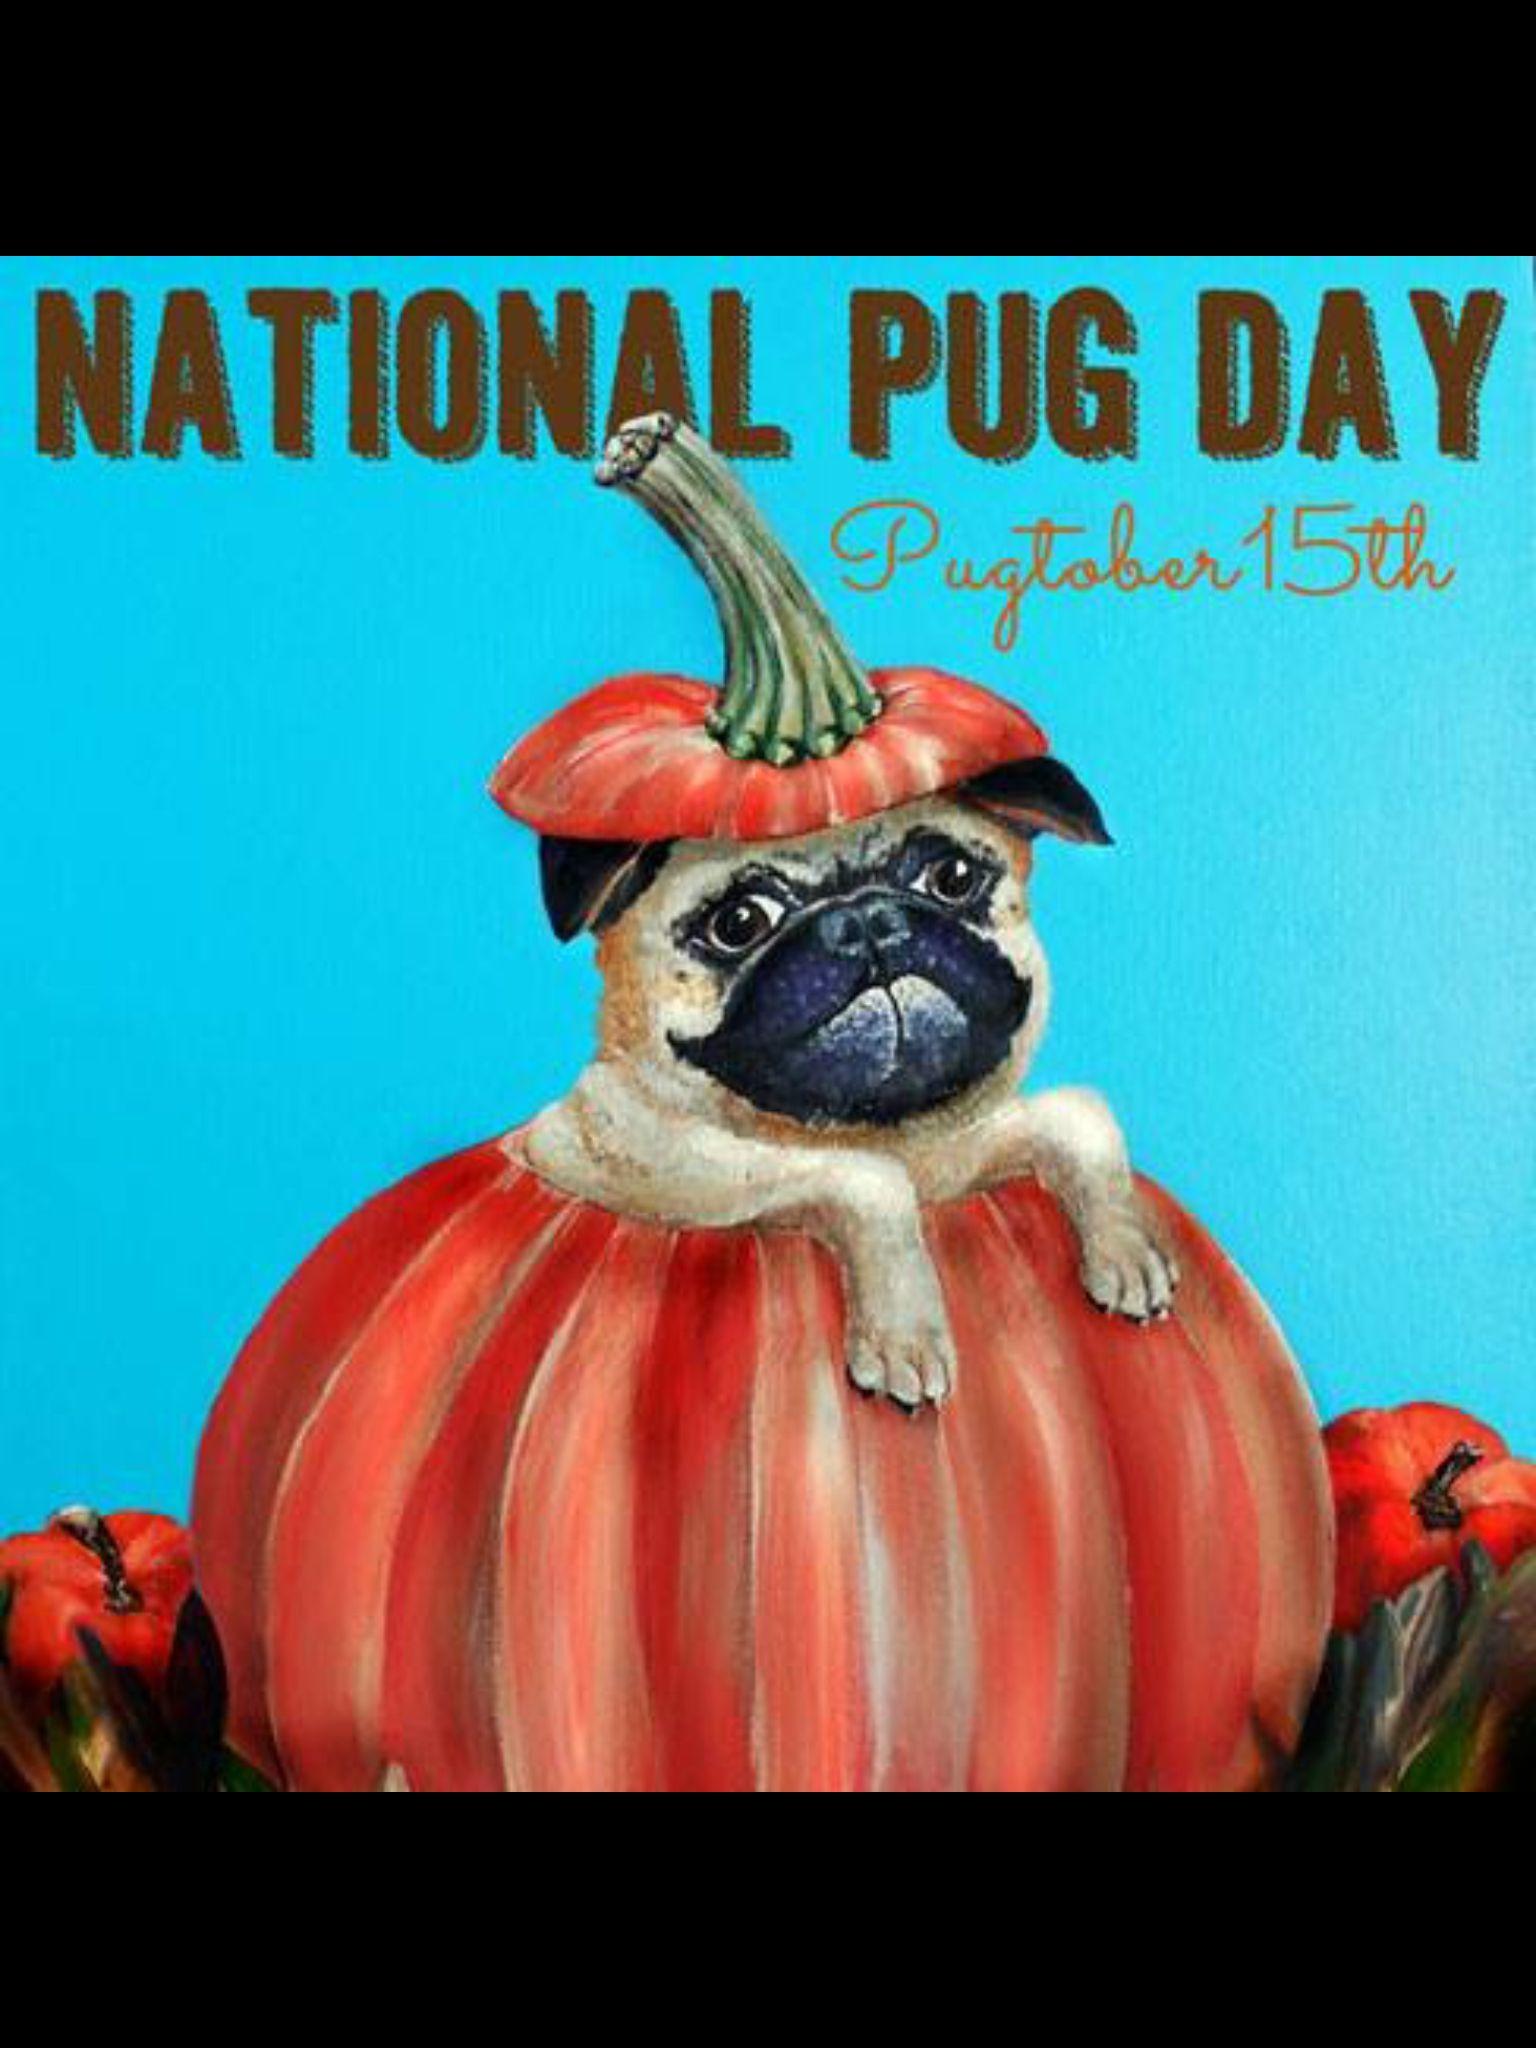 October 15th Pug rescue, Pugs, Cute pugs